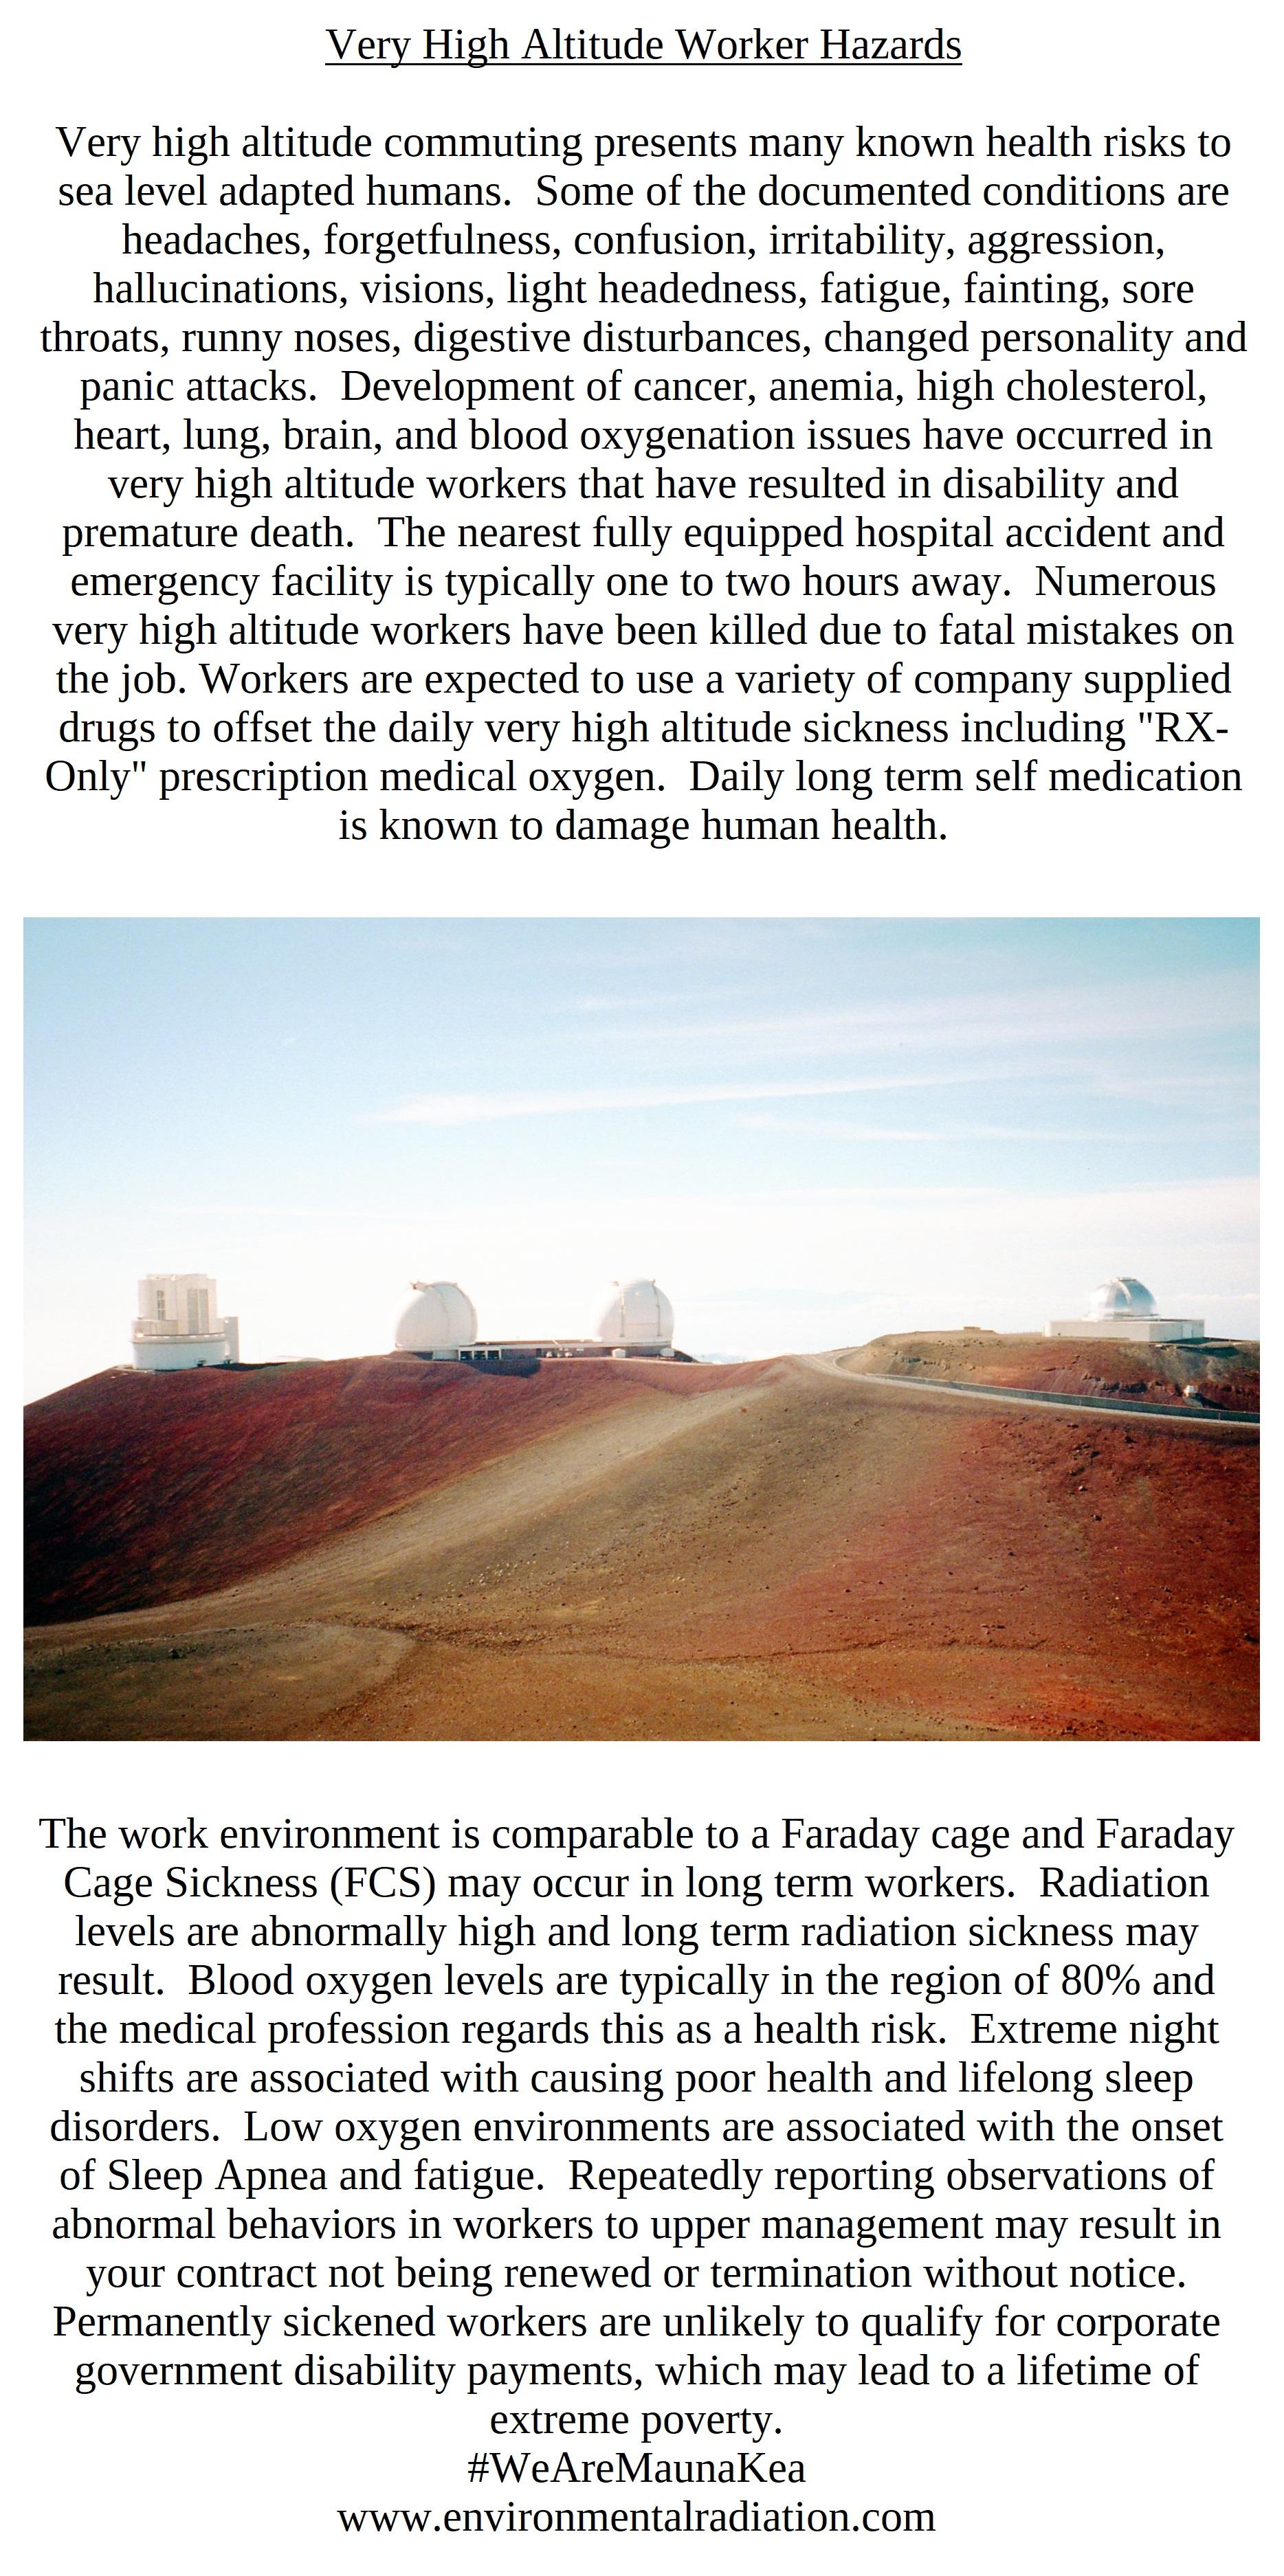 Environmental Radiation Llc For 1994 Geo Tracker Fuse Box Very High Altitude Hazards